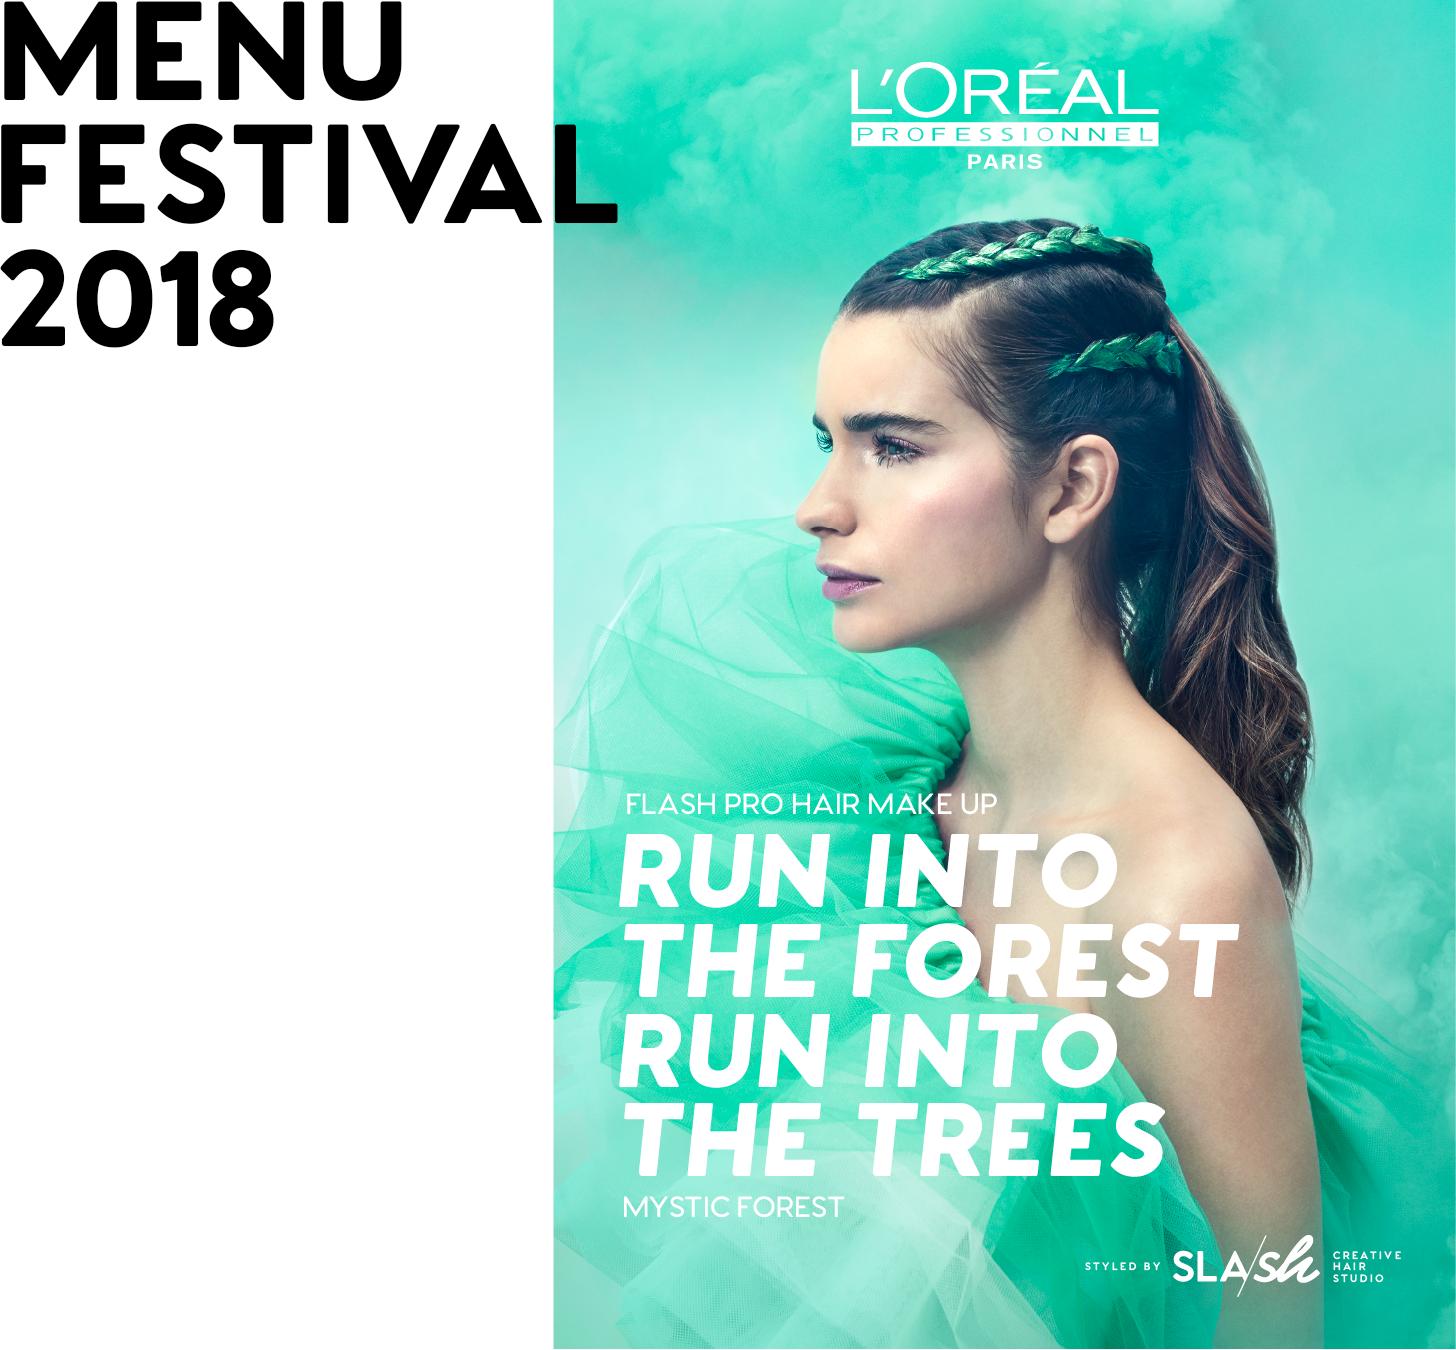 menu-festival-2018_2_run_into_the_forest_run_into_the_trees